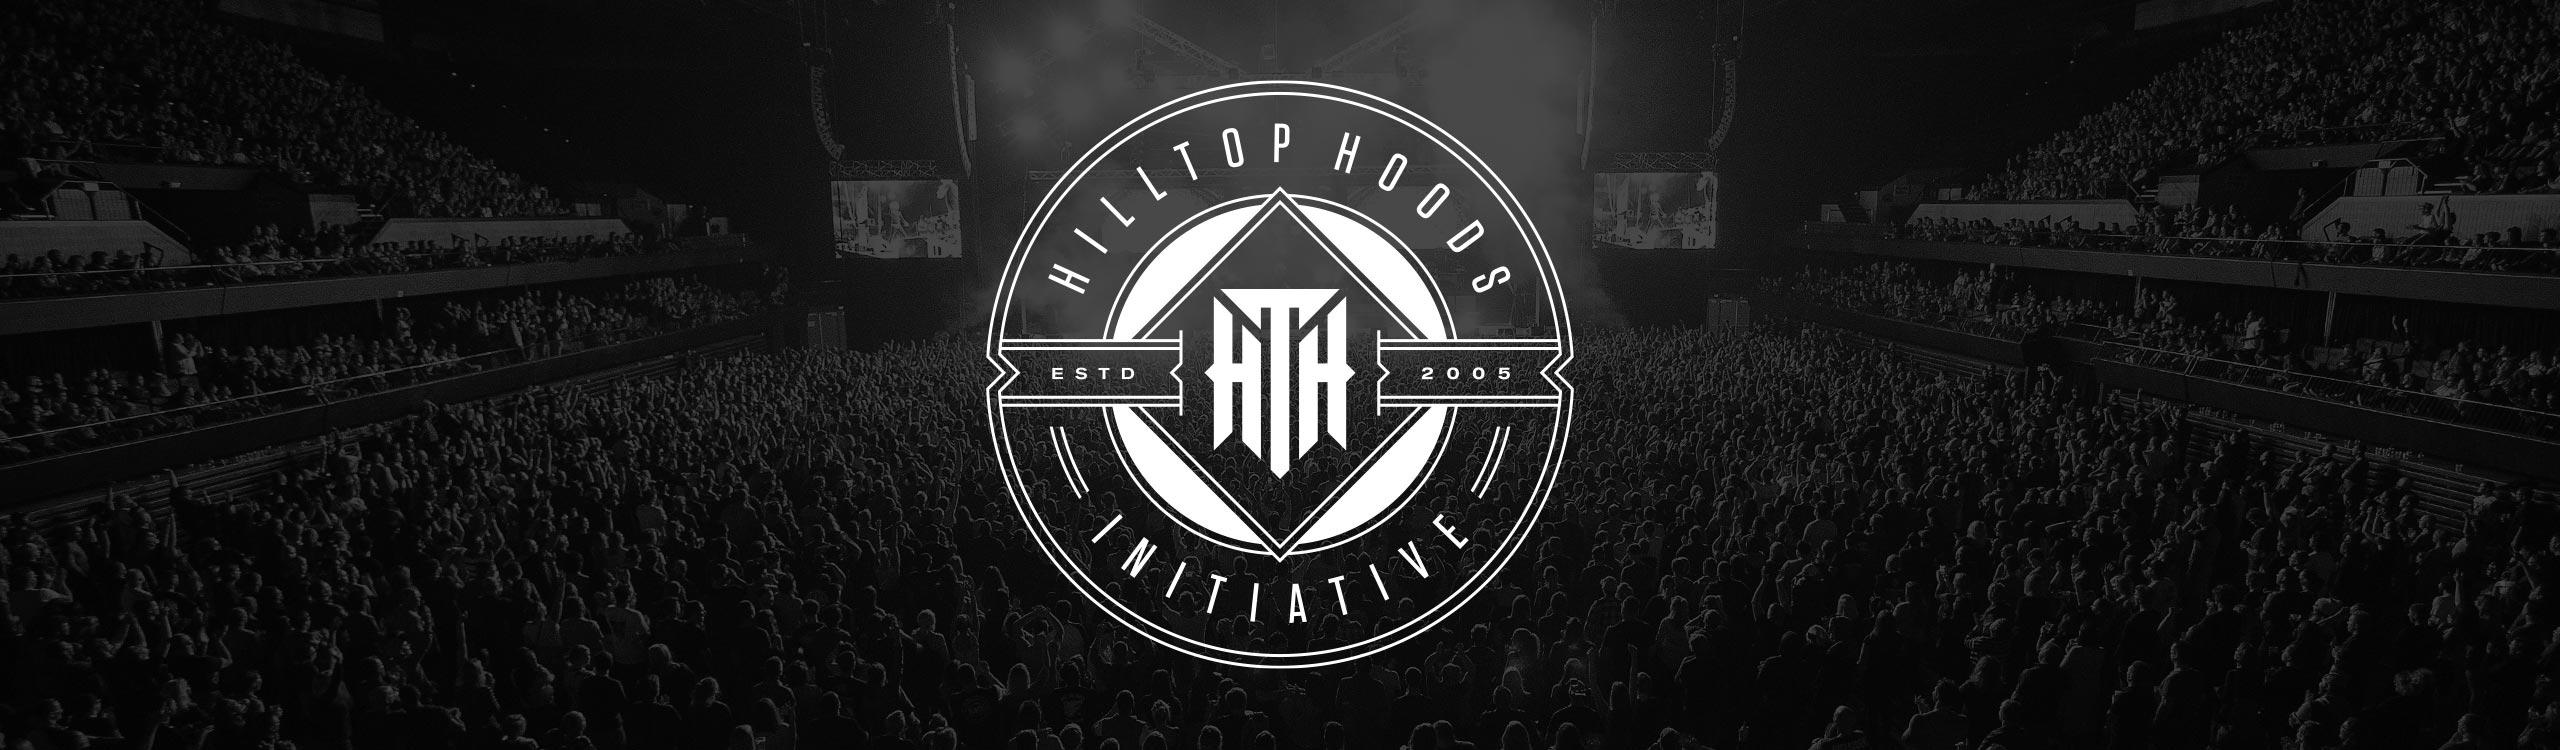 Hilltop Hoods Hth Initiative